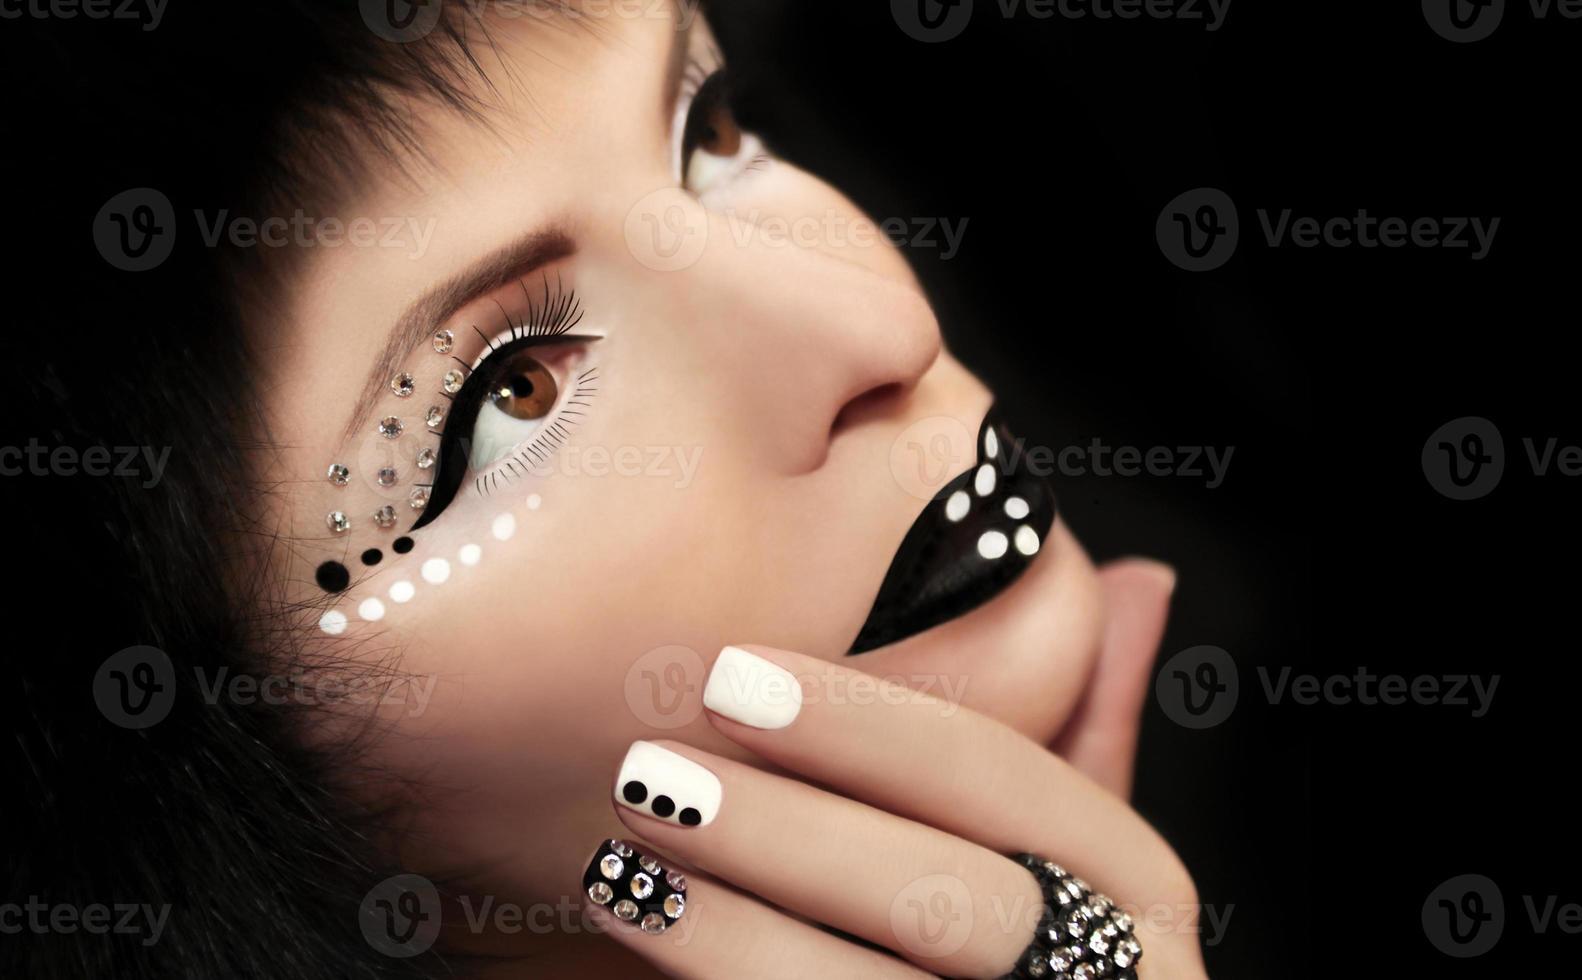 maquillage et manucure avec strass. photo